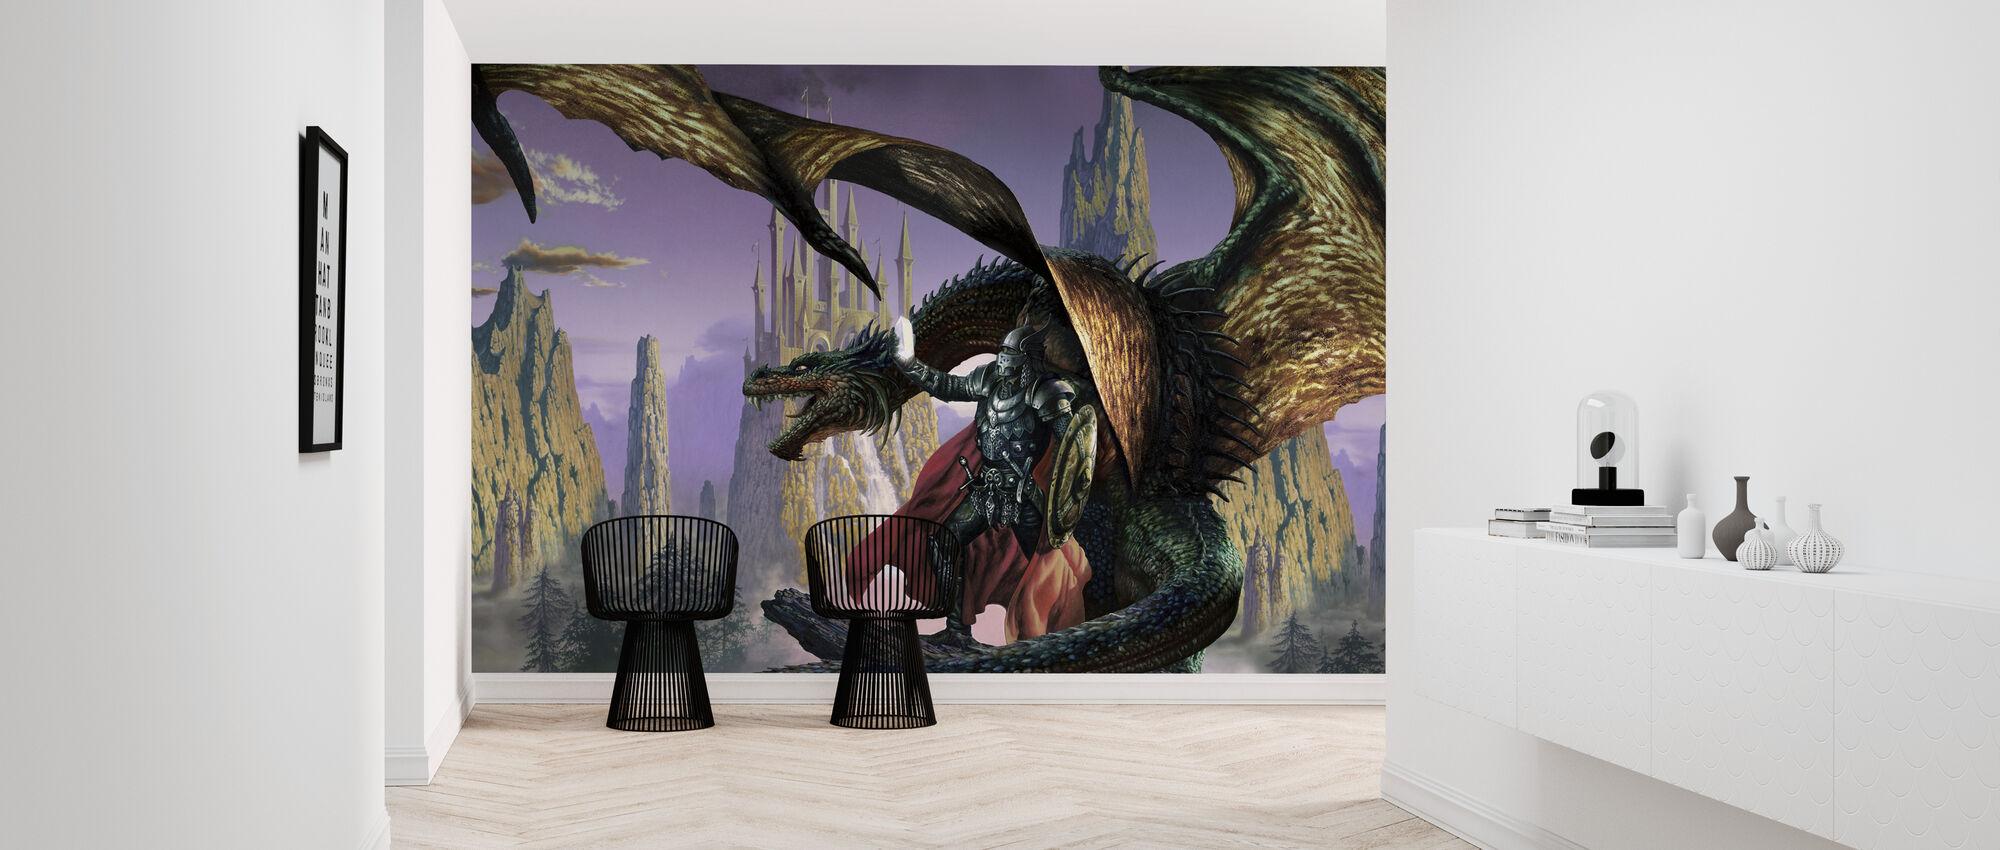 Crepusculo - Wallpaper - Hallway